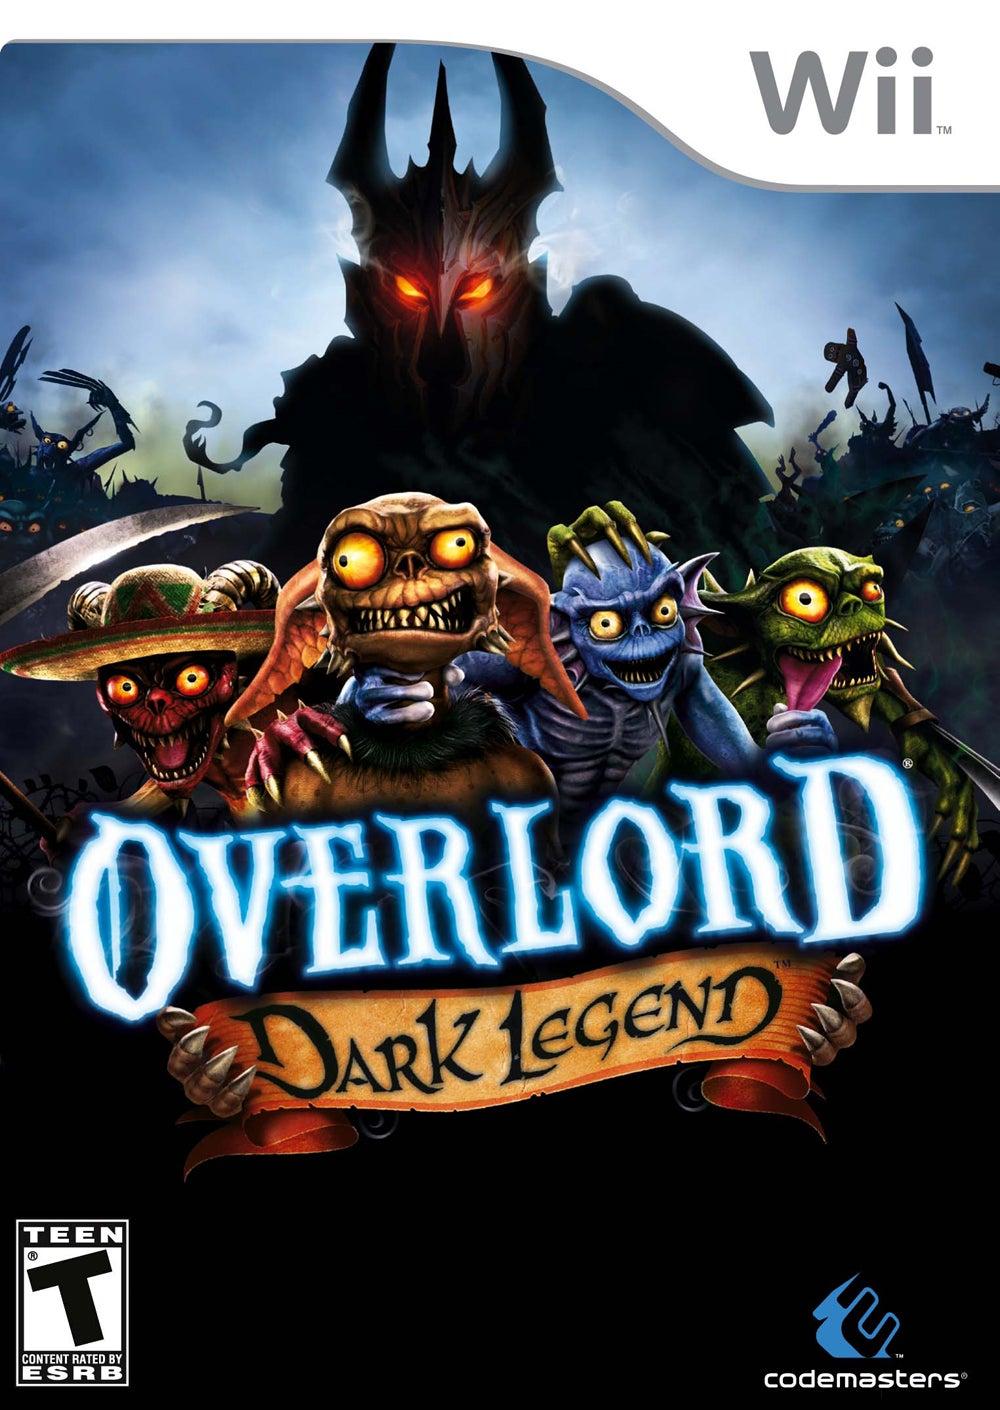 Overlord Dark Legend Wii IGN